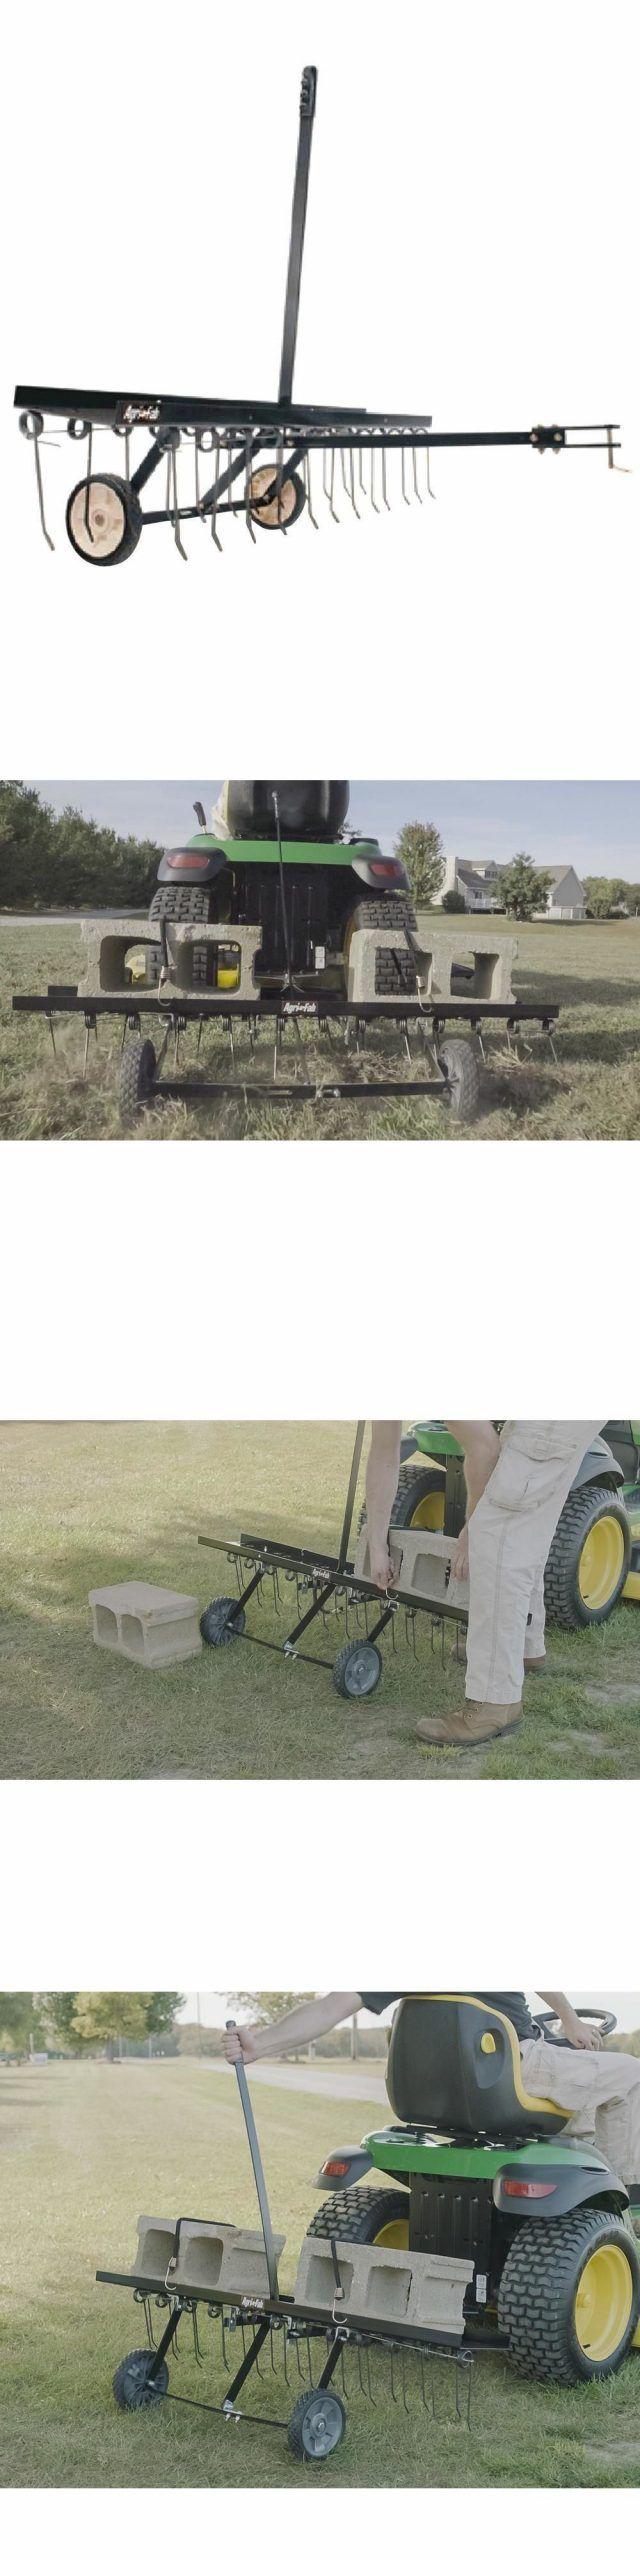 Lawn Aerators 115775 Dethatching Rake Blade Lawn Tractor